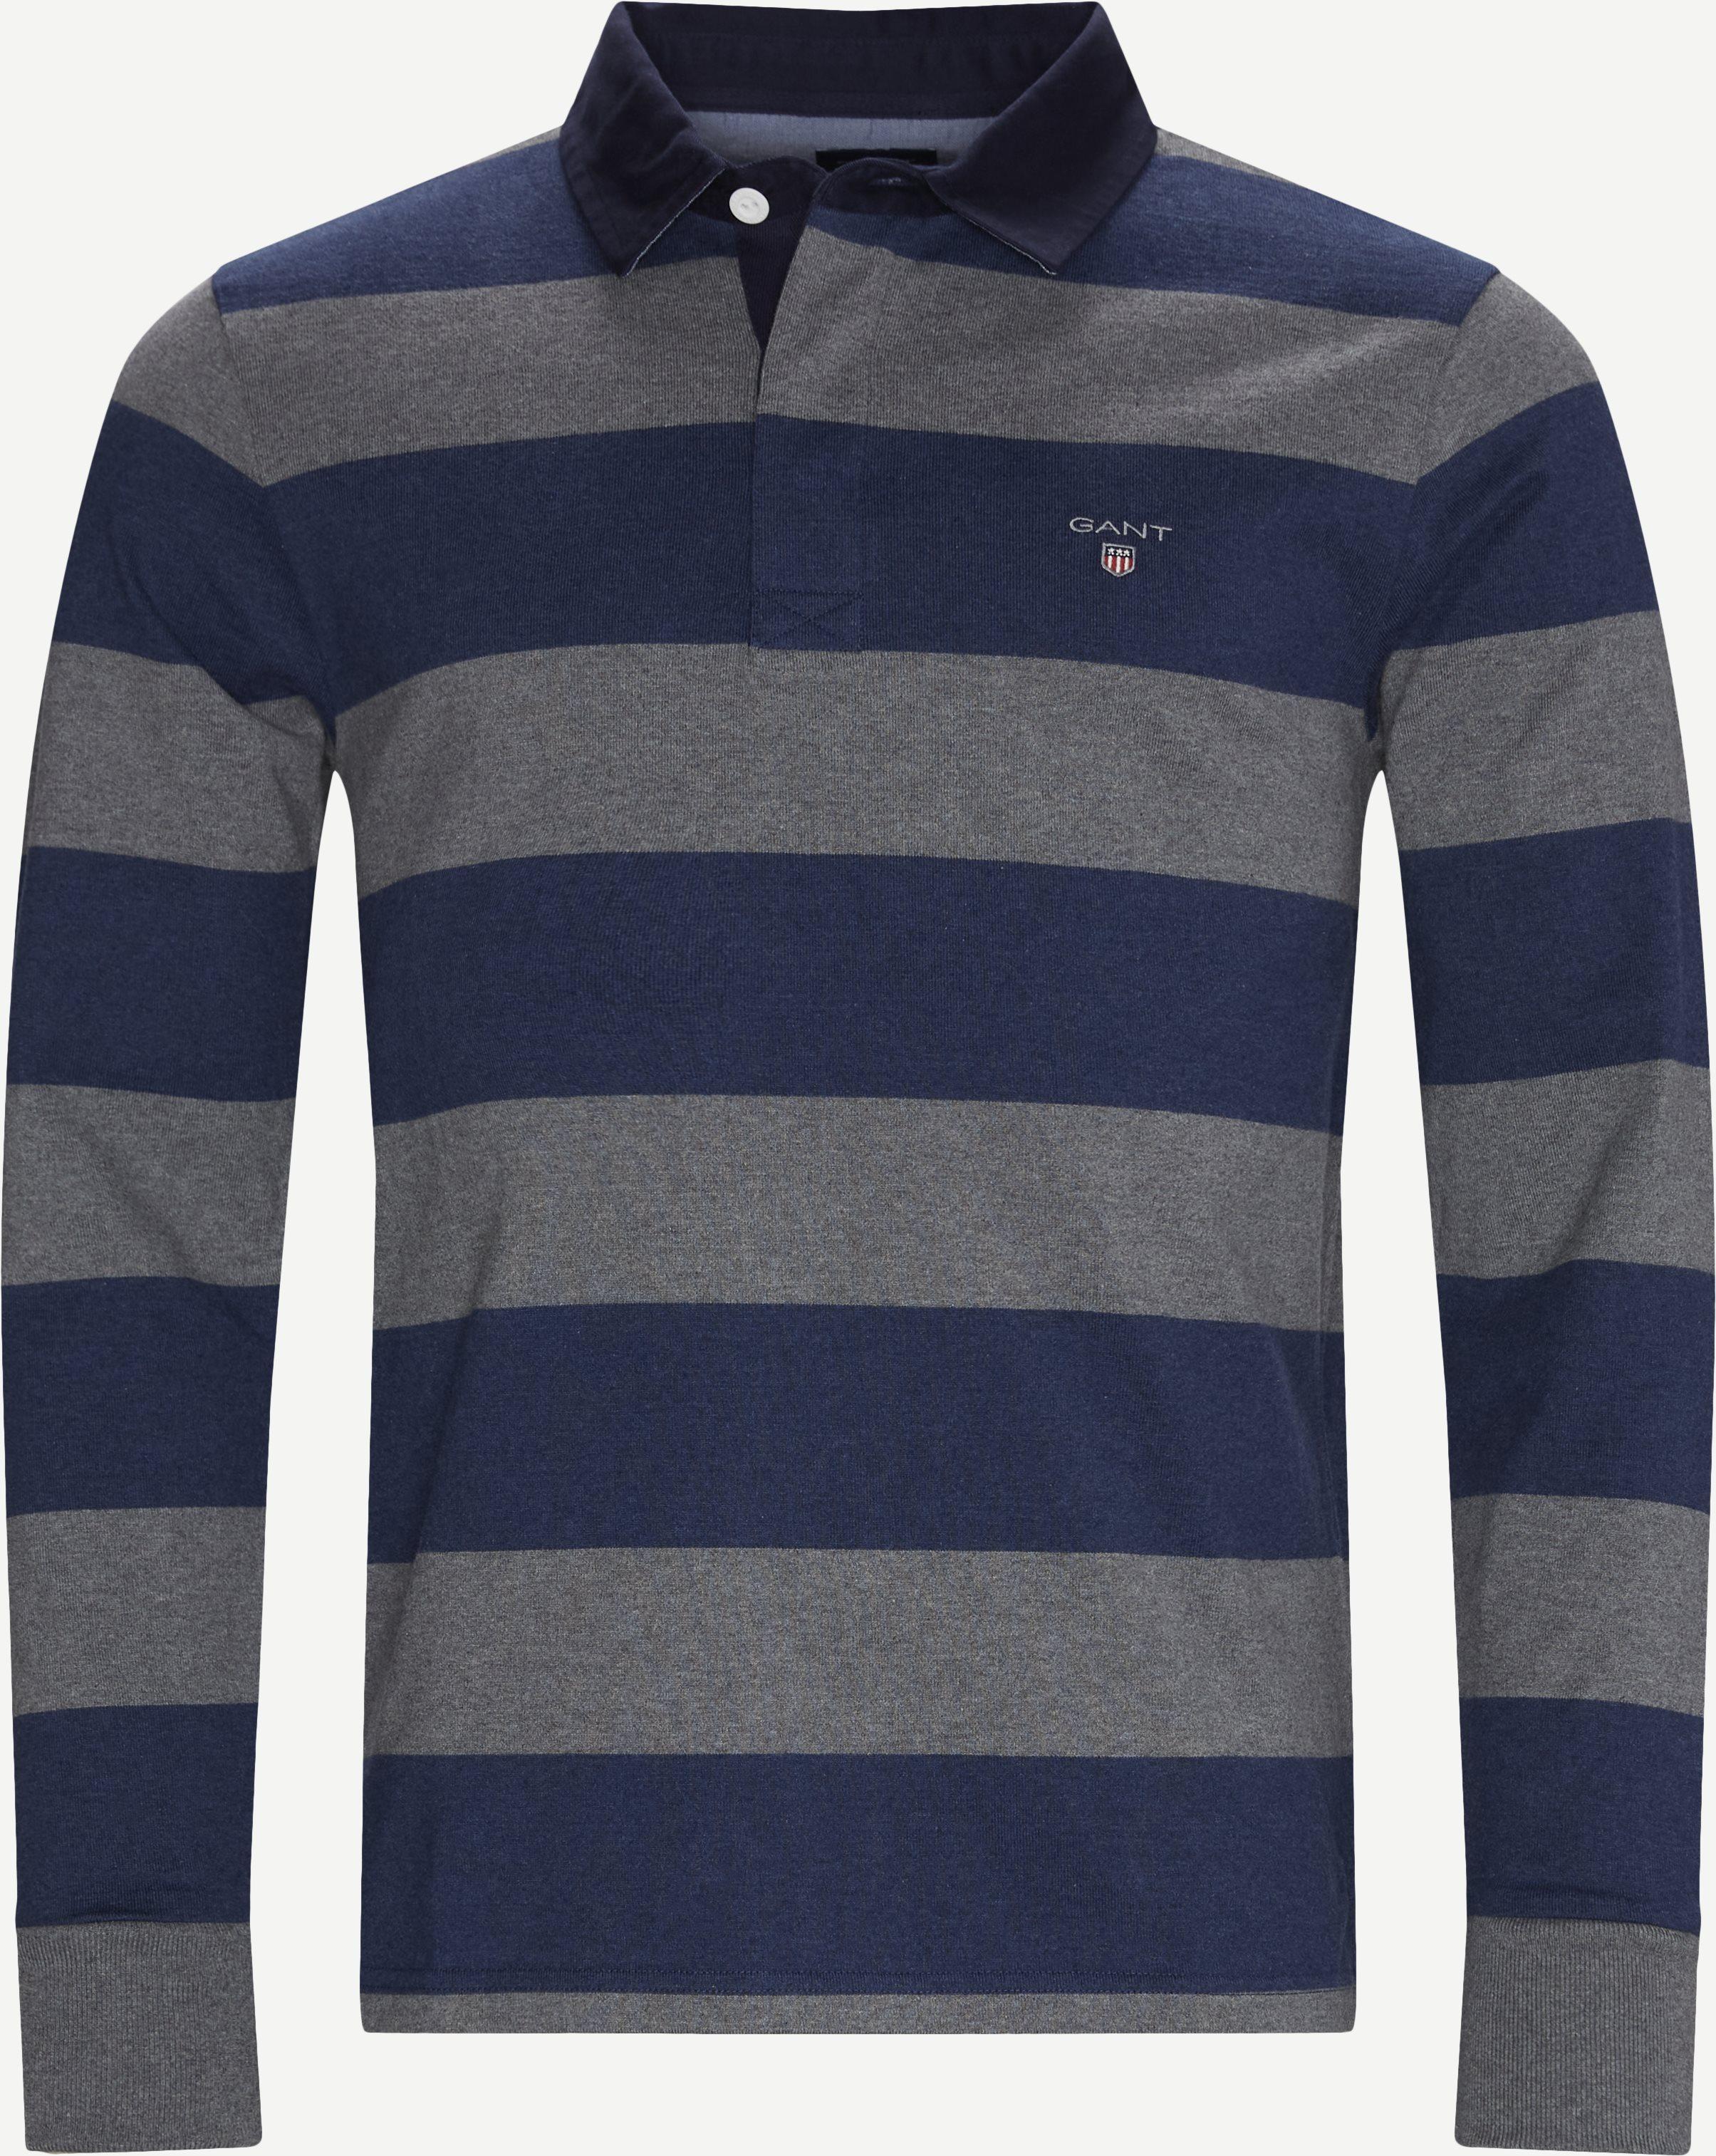 Original Heavy Rugger LS T-shirt - T-shirts - Regular fit - Blue